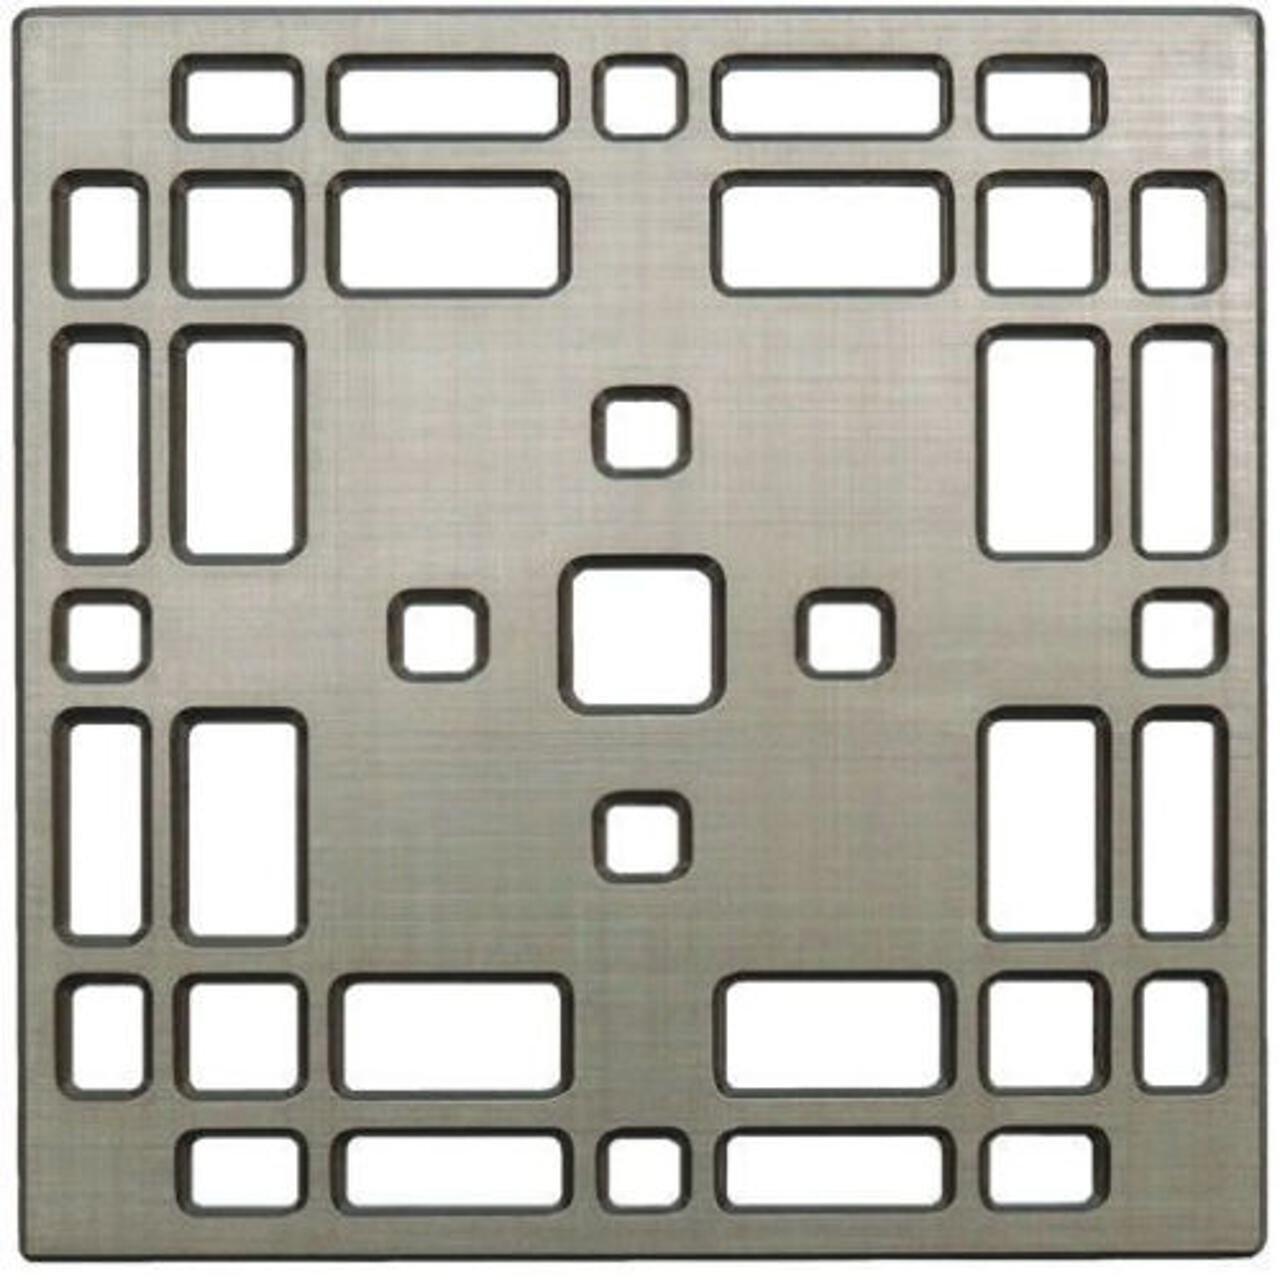 E4801-BN Praire Decoratve Drain Grate, Brushed Nickel